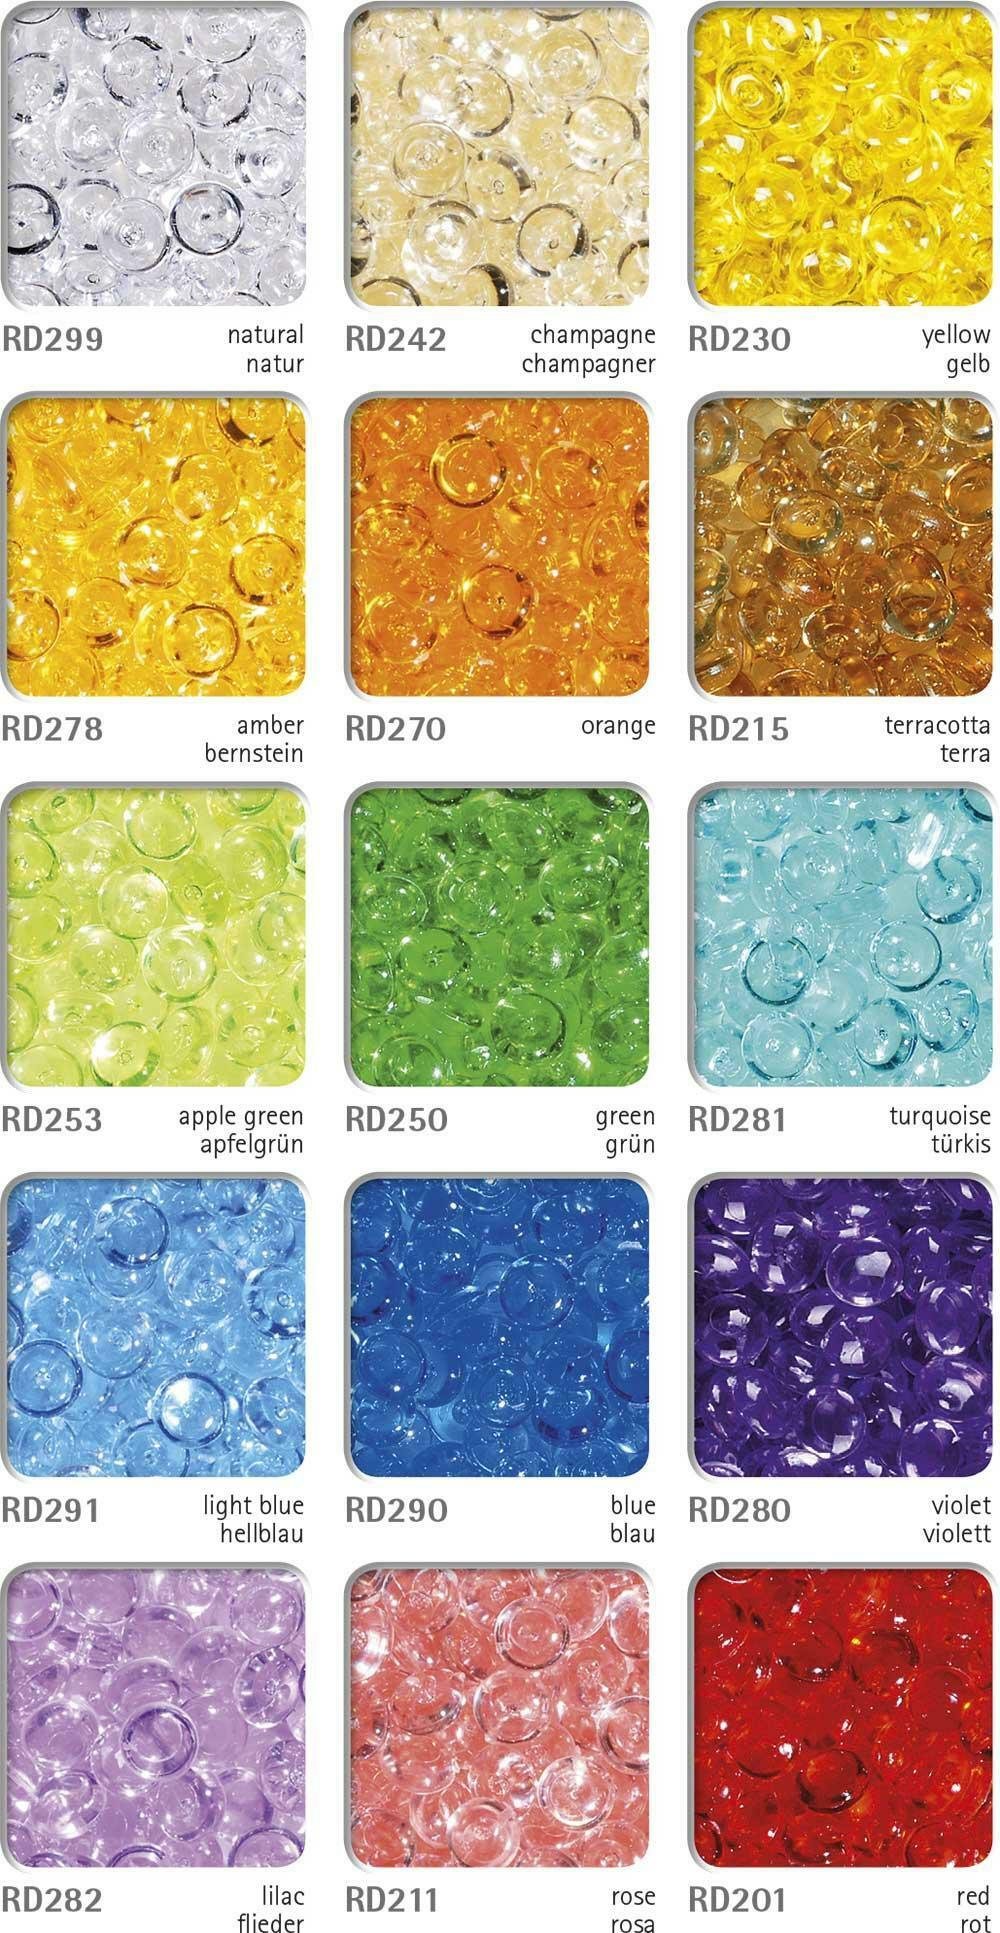 eurosand gocce di pioggia 2-4 mm in pvc trasparente - 333 ml